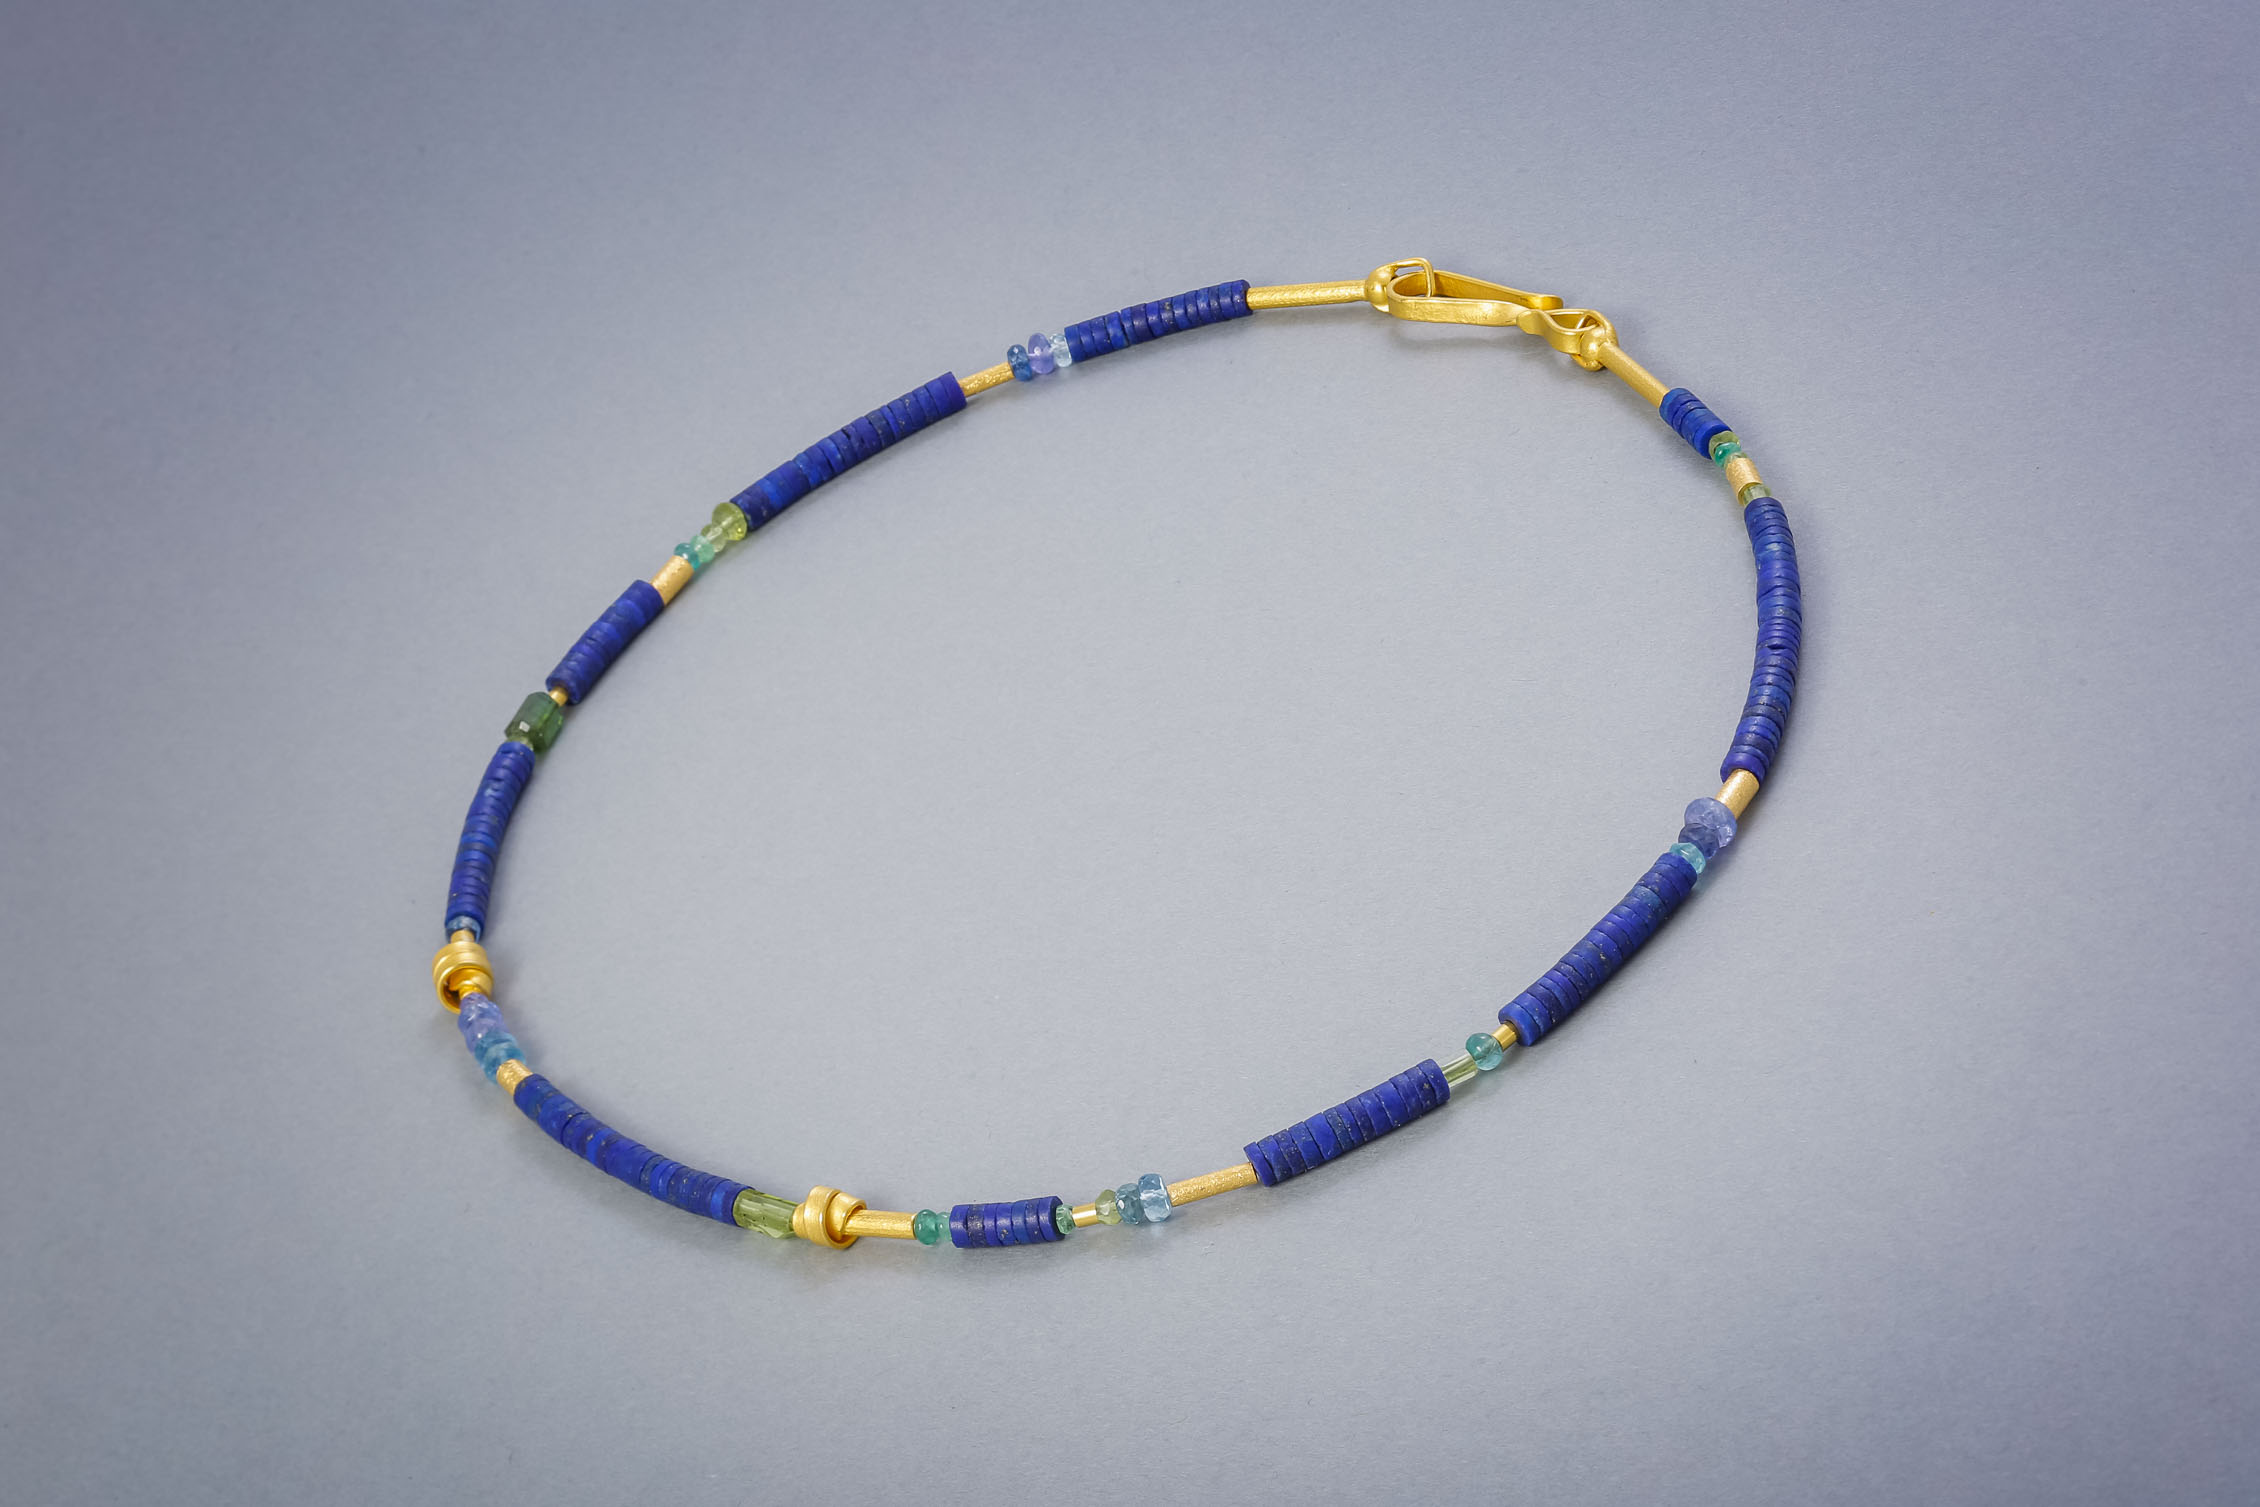 139 Edelsteinkette, Silber vergoldet, Lapis, Aquamarin, Peridot ab €258,-